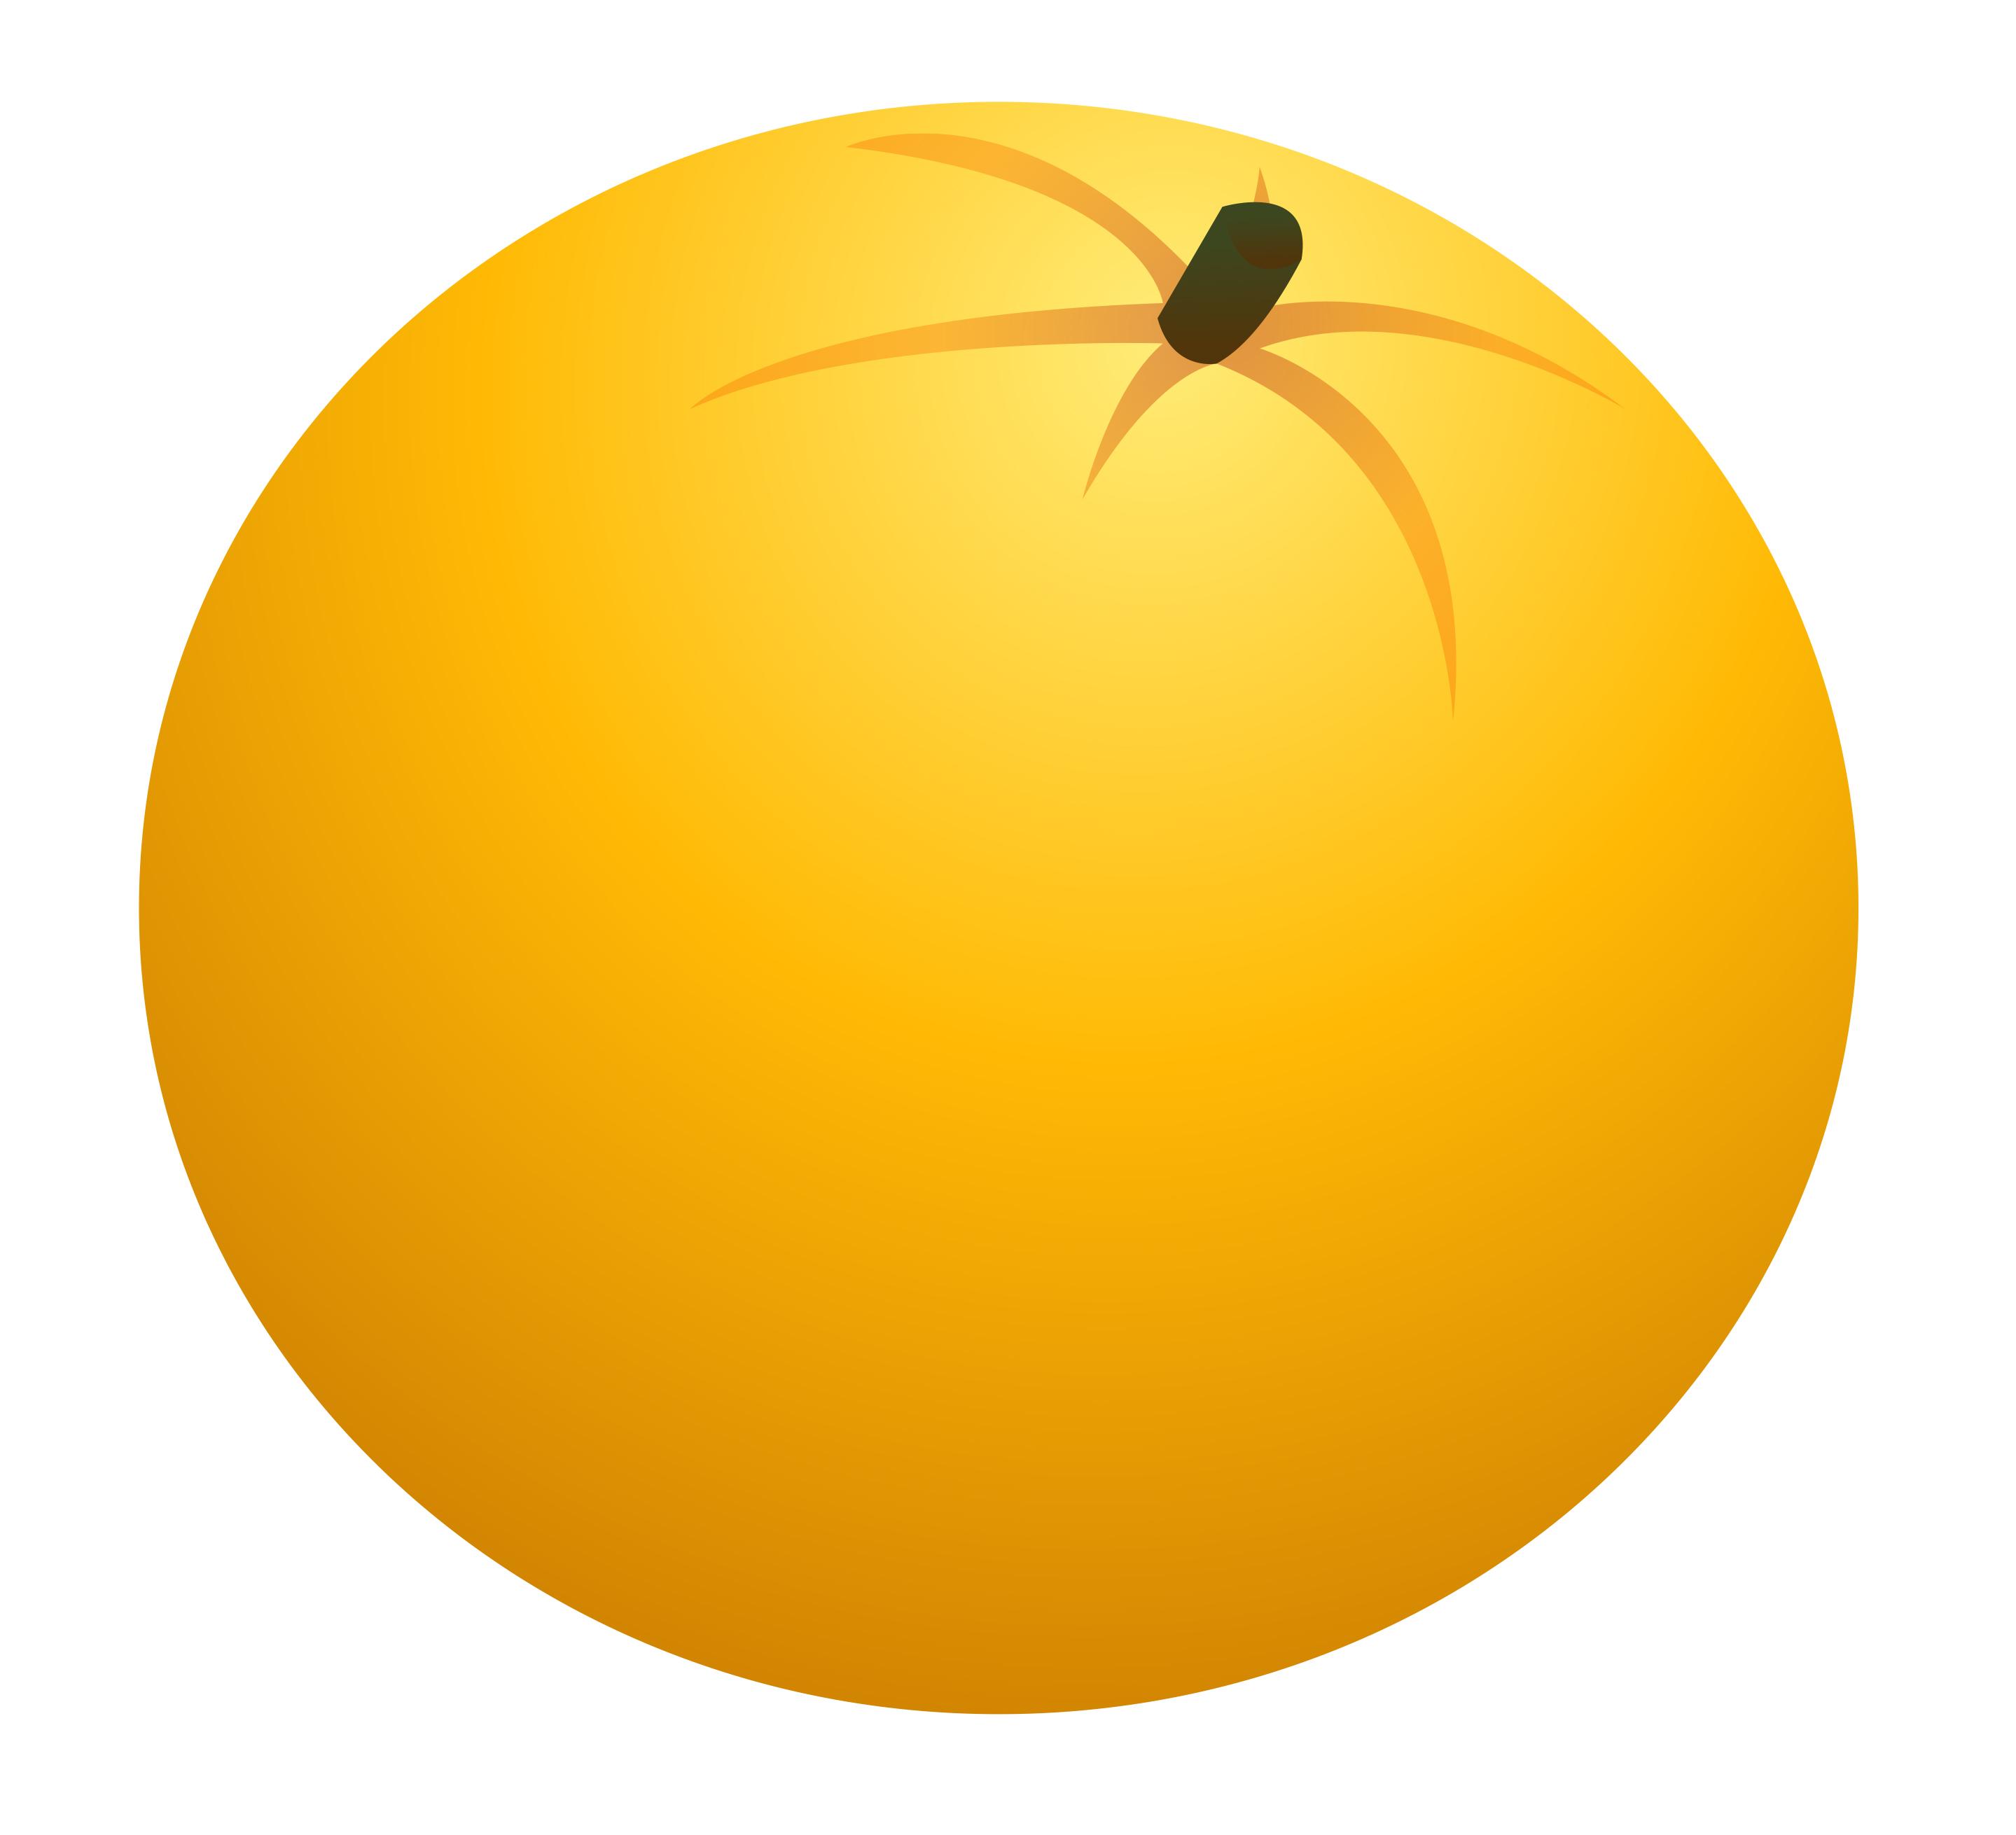 Grapefruit clipart View jpg ▼ Download Healthy